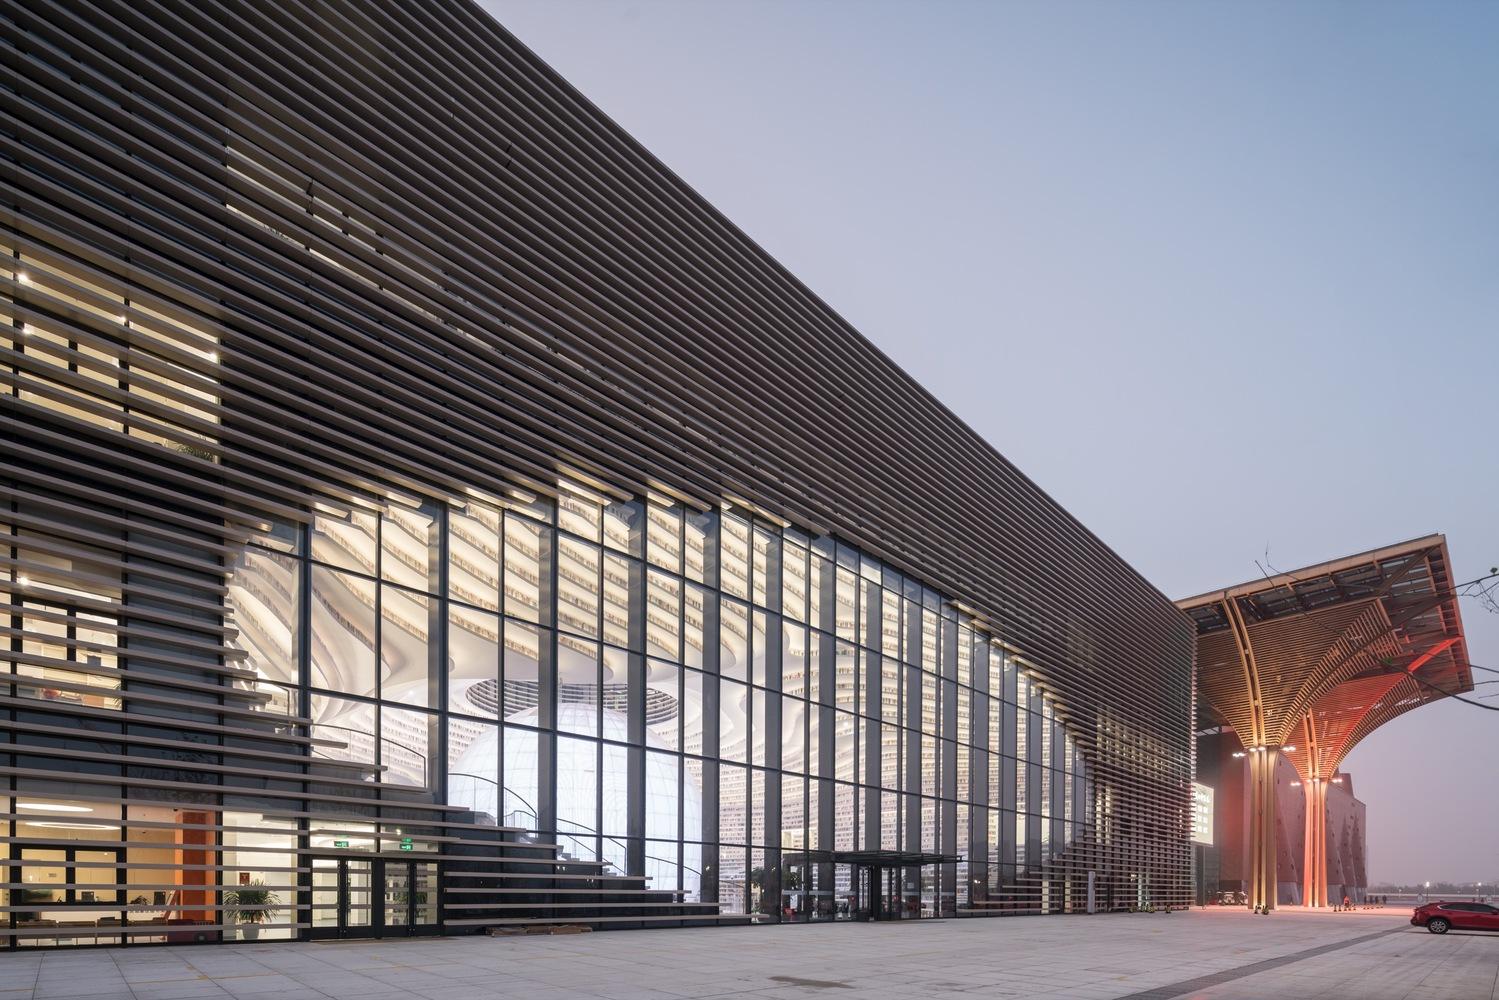 14_Tianjin Binhai Library_MVRDV_Inspirationist